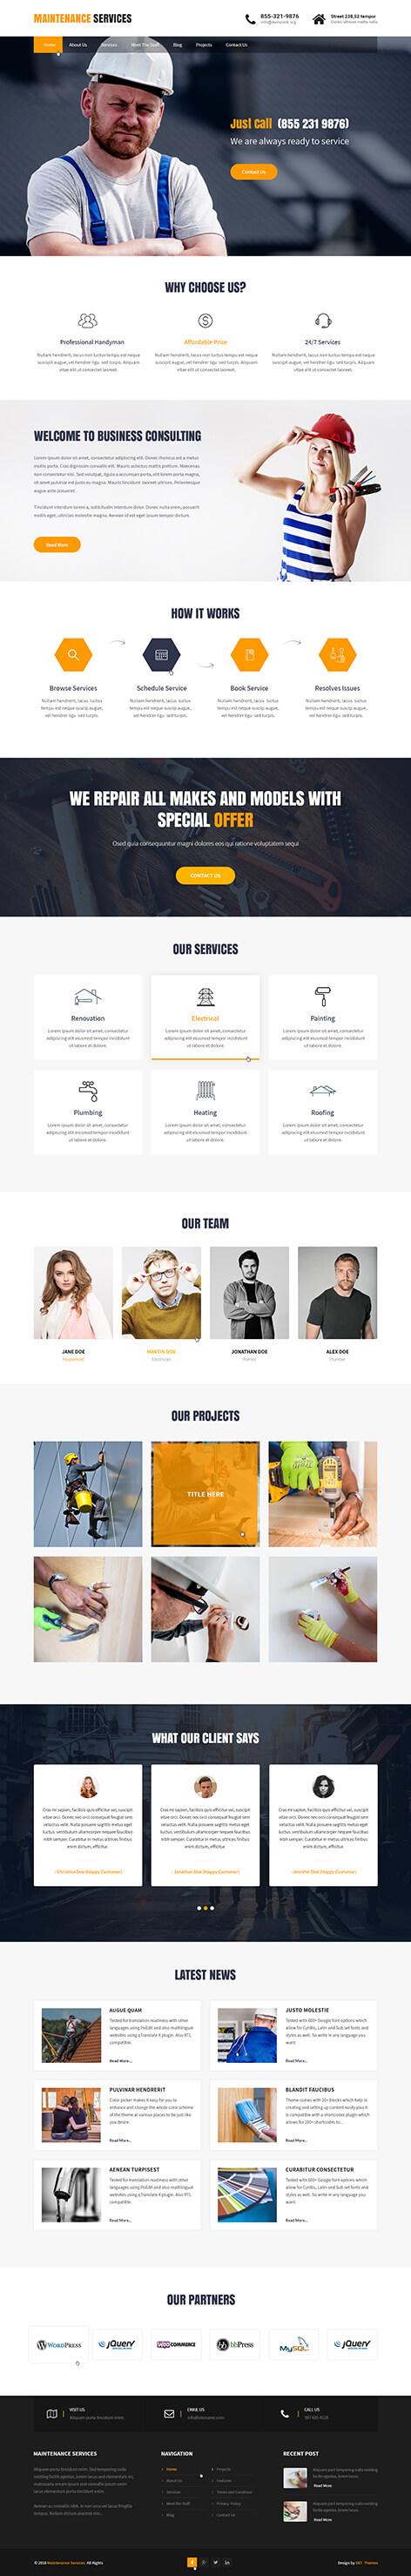 home services WordPress theme